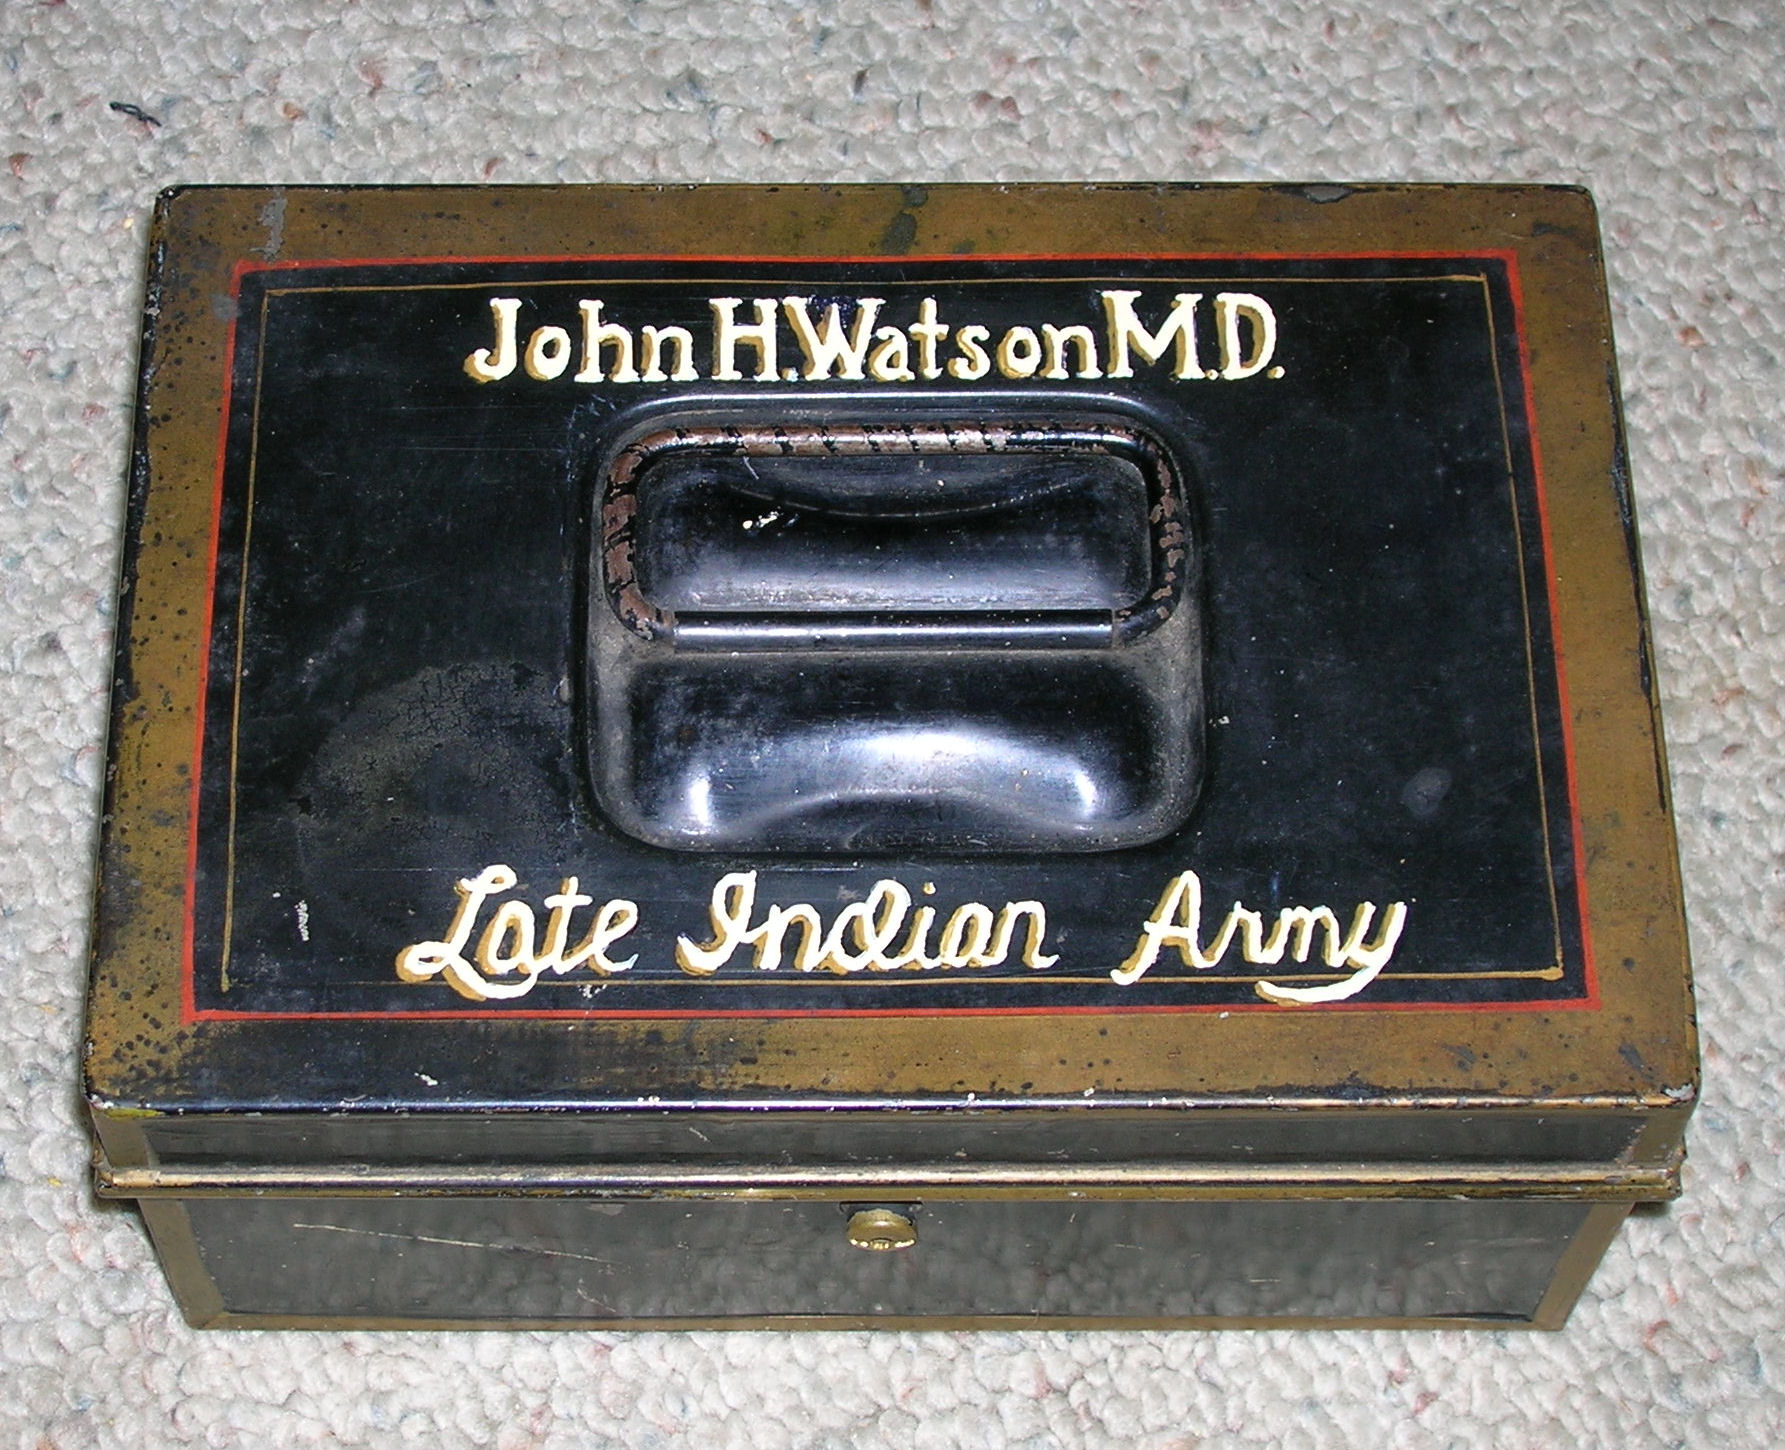 From Watson's Tin Box: His Last Bow